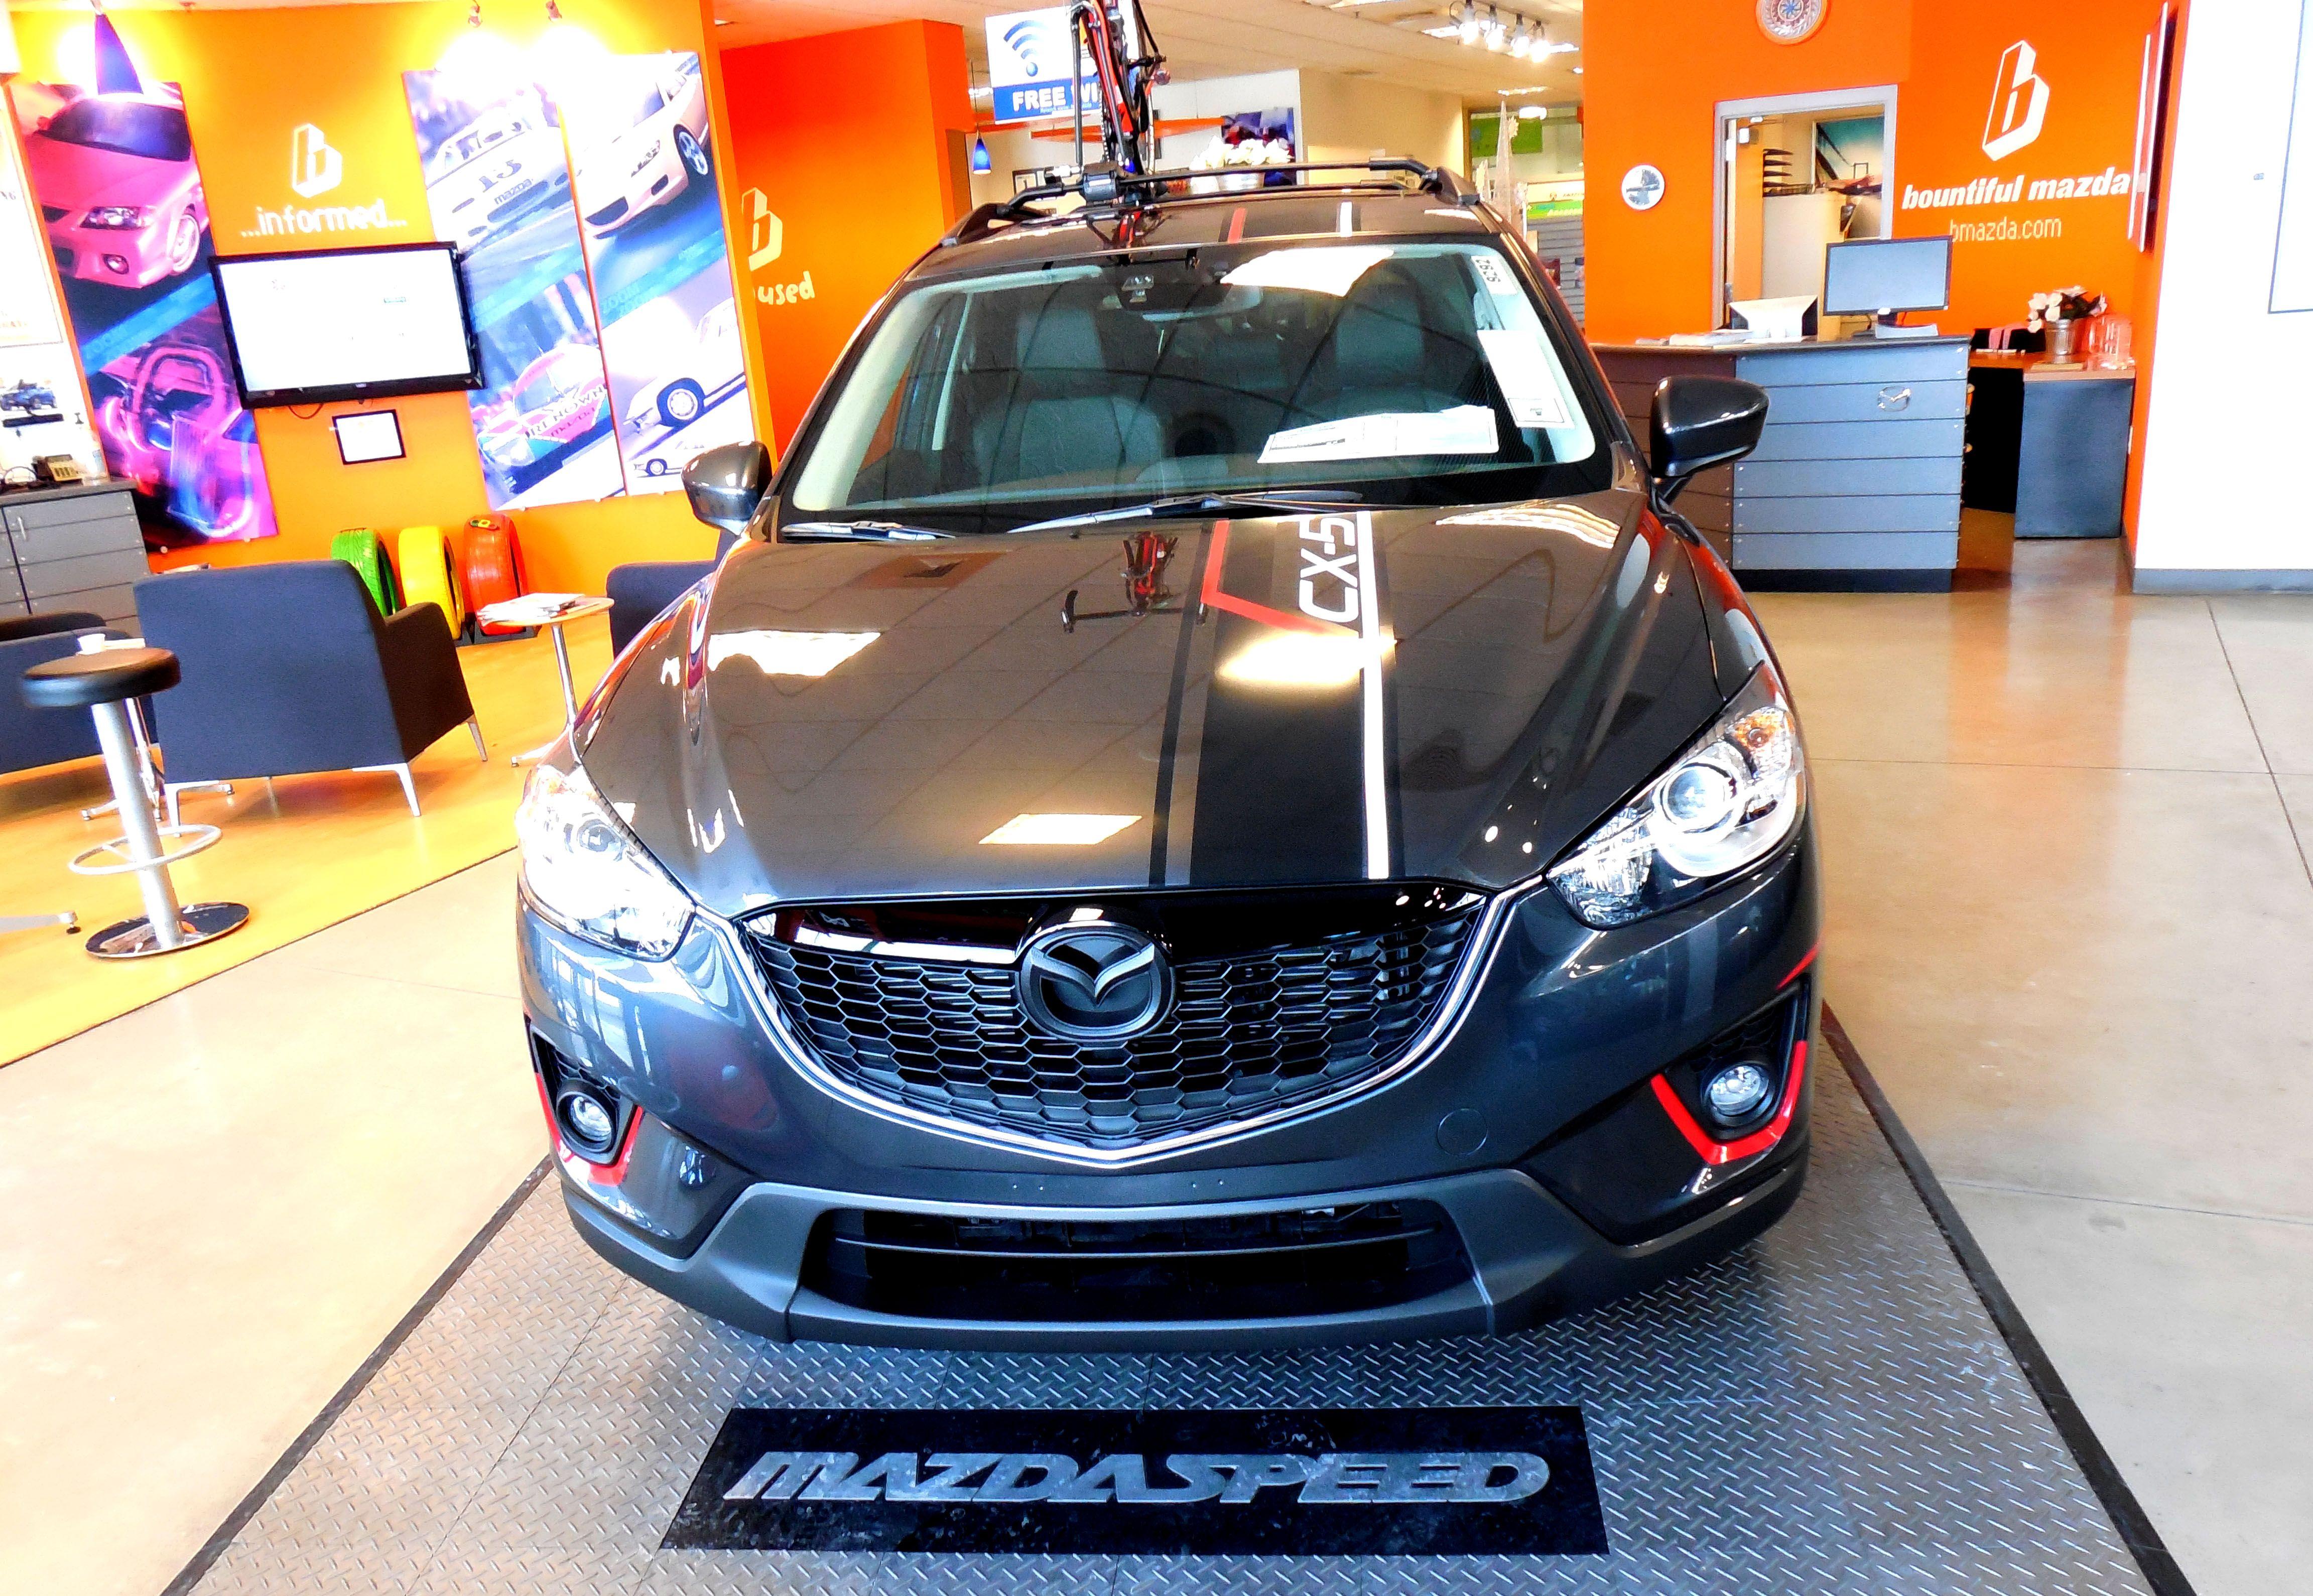 bountiful mazda s 2014 mazda cx 5 tricked out cars